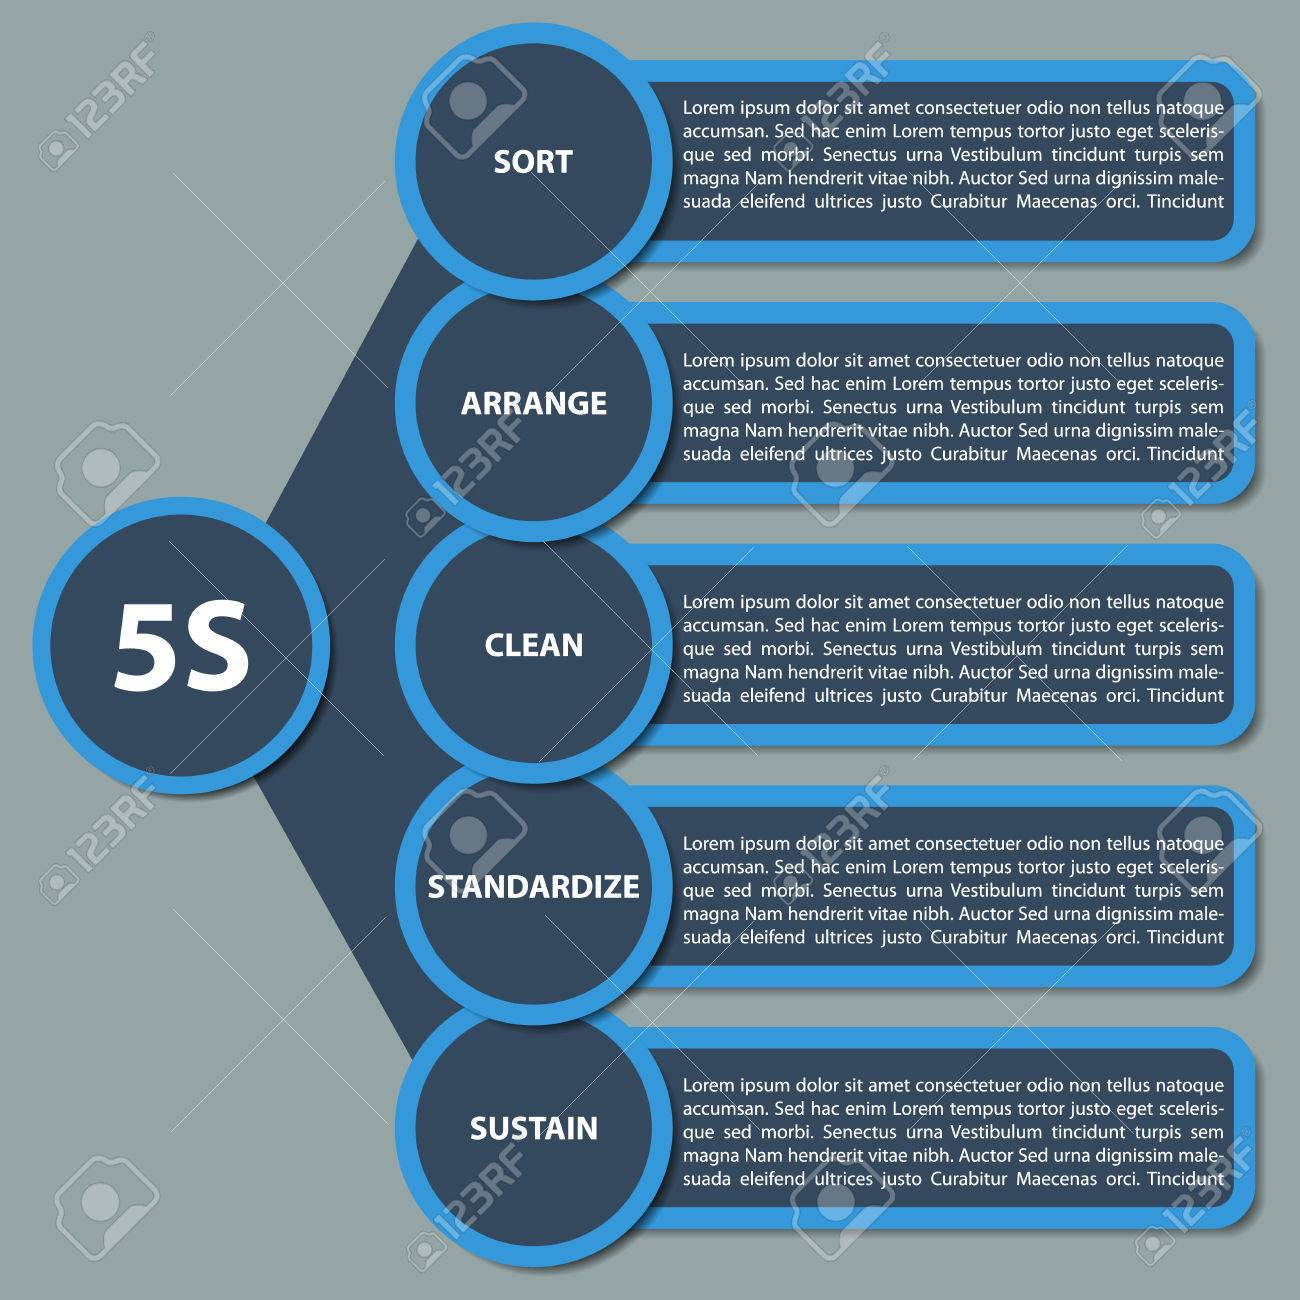 Illustration of modern strategy 5s description in english language illustration illustration of modern strategy 5s description in english language ccuart Images